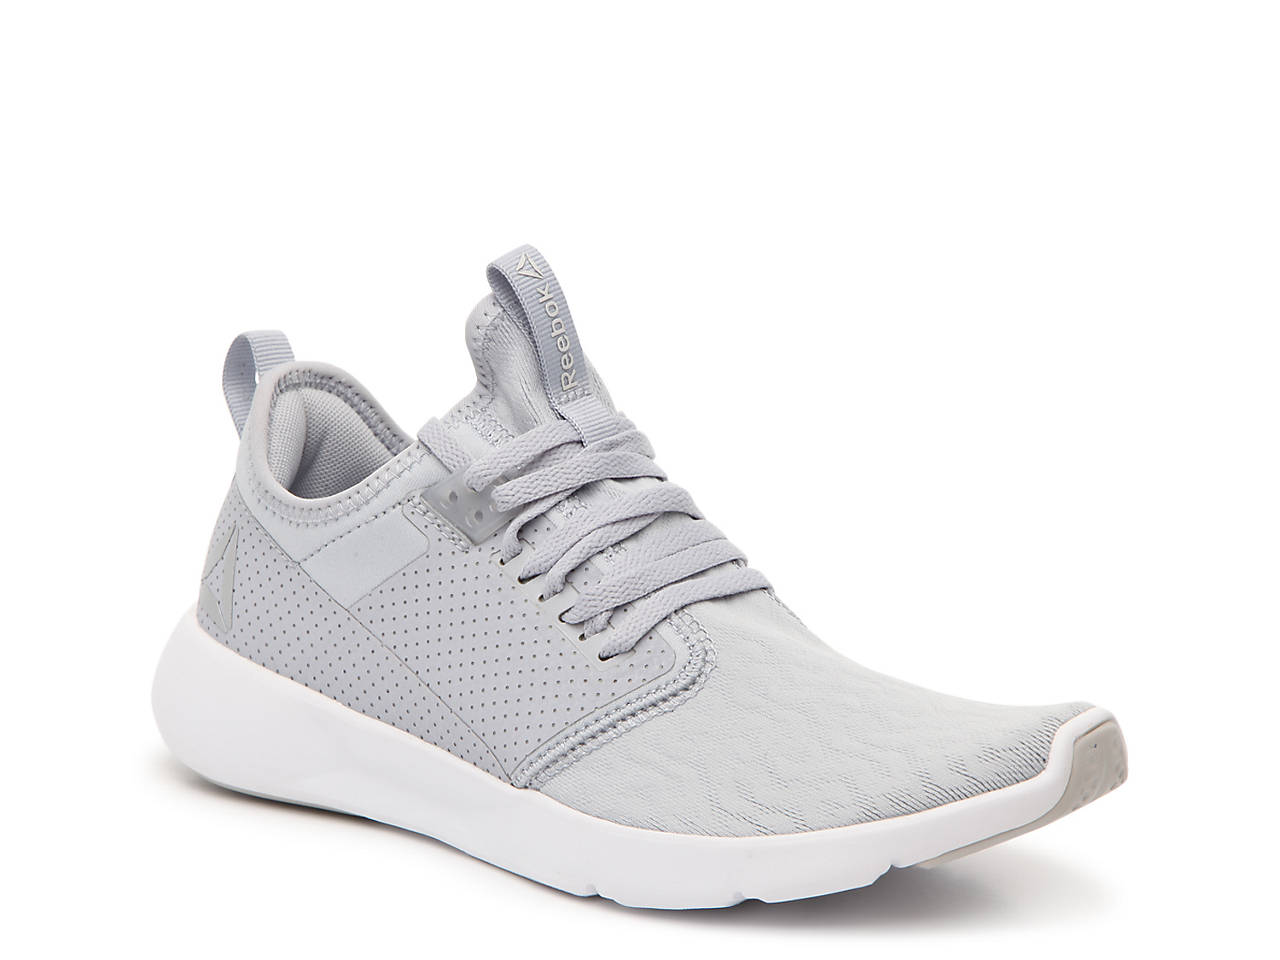 ff4f2ff5fcc Reebok Plus Lite 2 Lightweight Running Shoe - Women s Women s Shoes ...